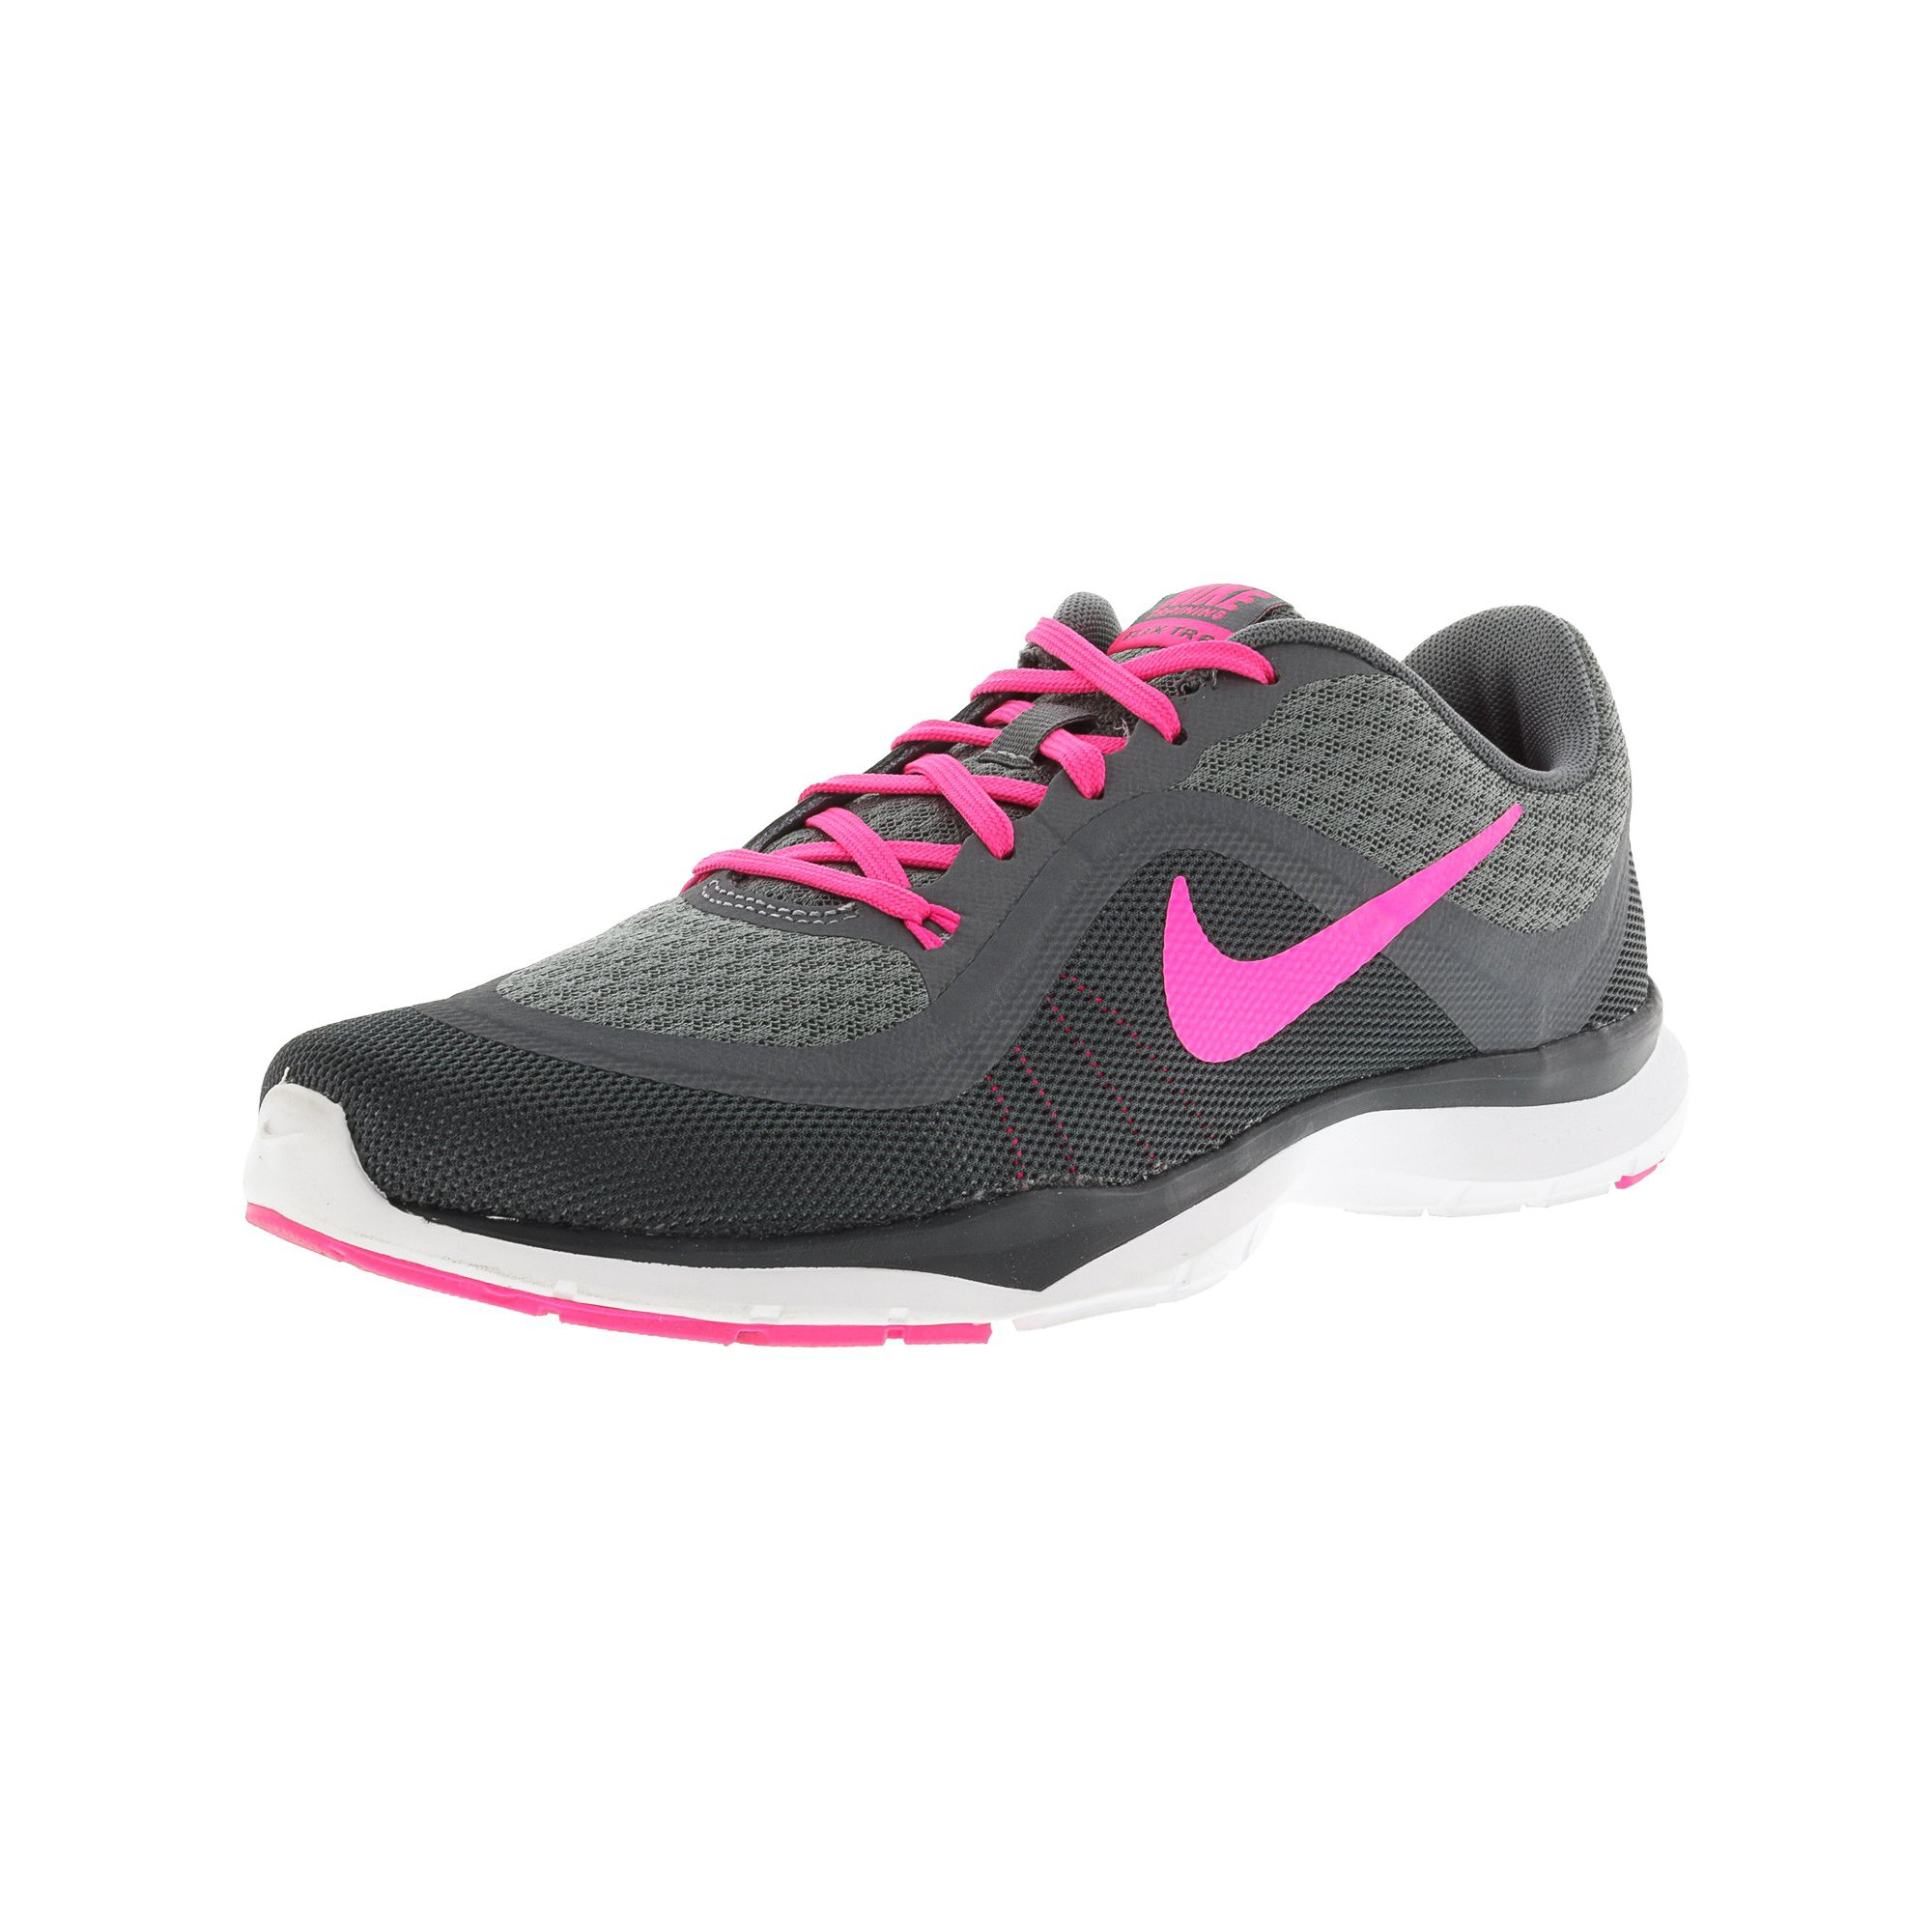 f03fd39c1007 Nike Women s Flex Trainer 6 Black   White Ankle-High Mesh Walking Shoe -  8.5M